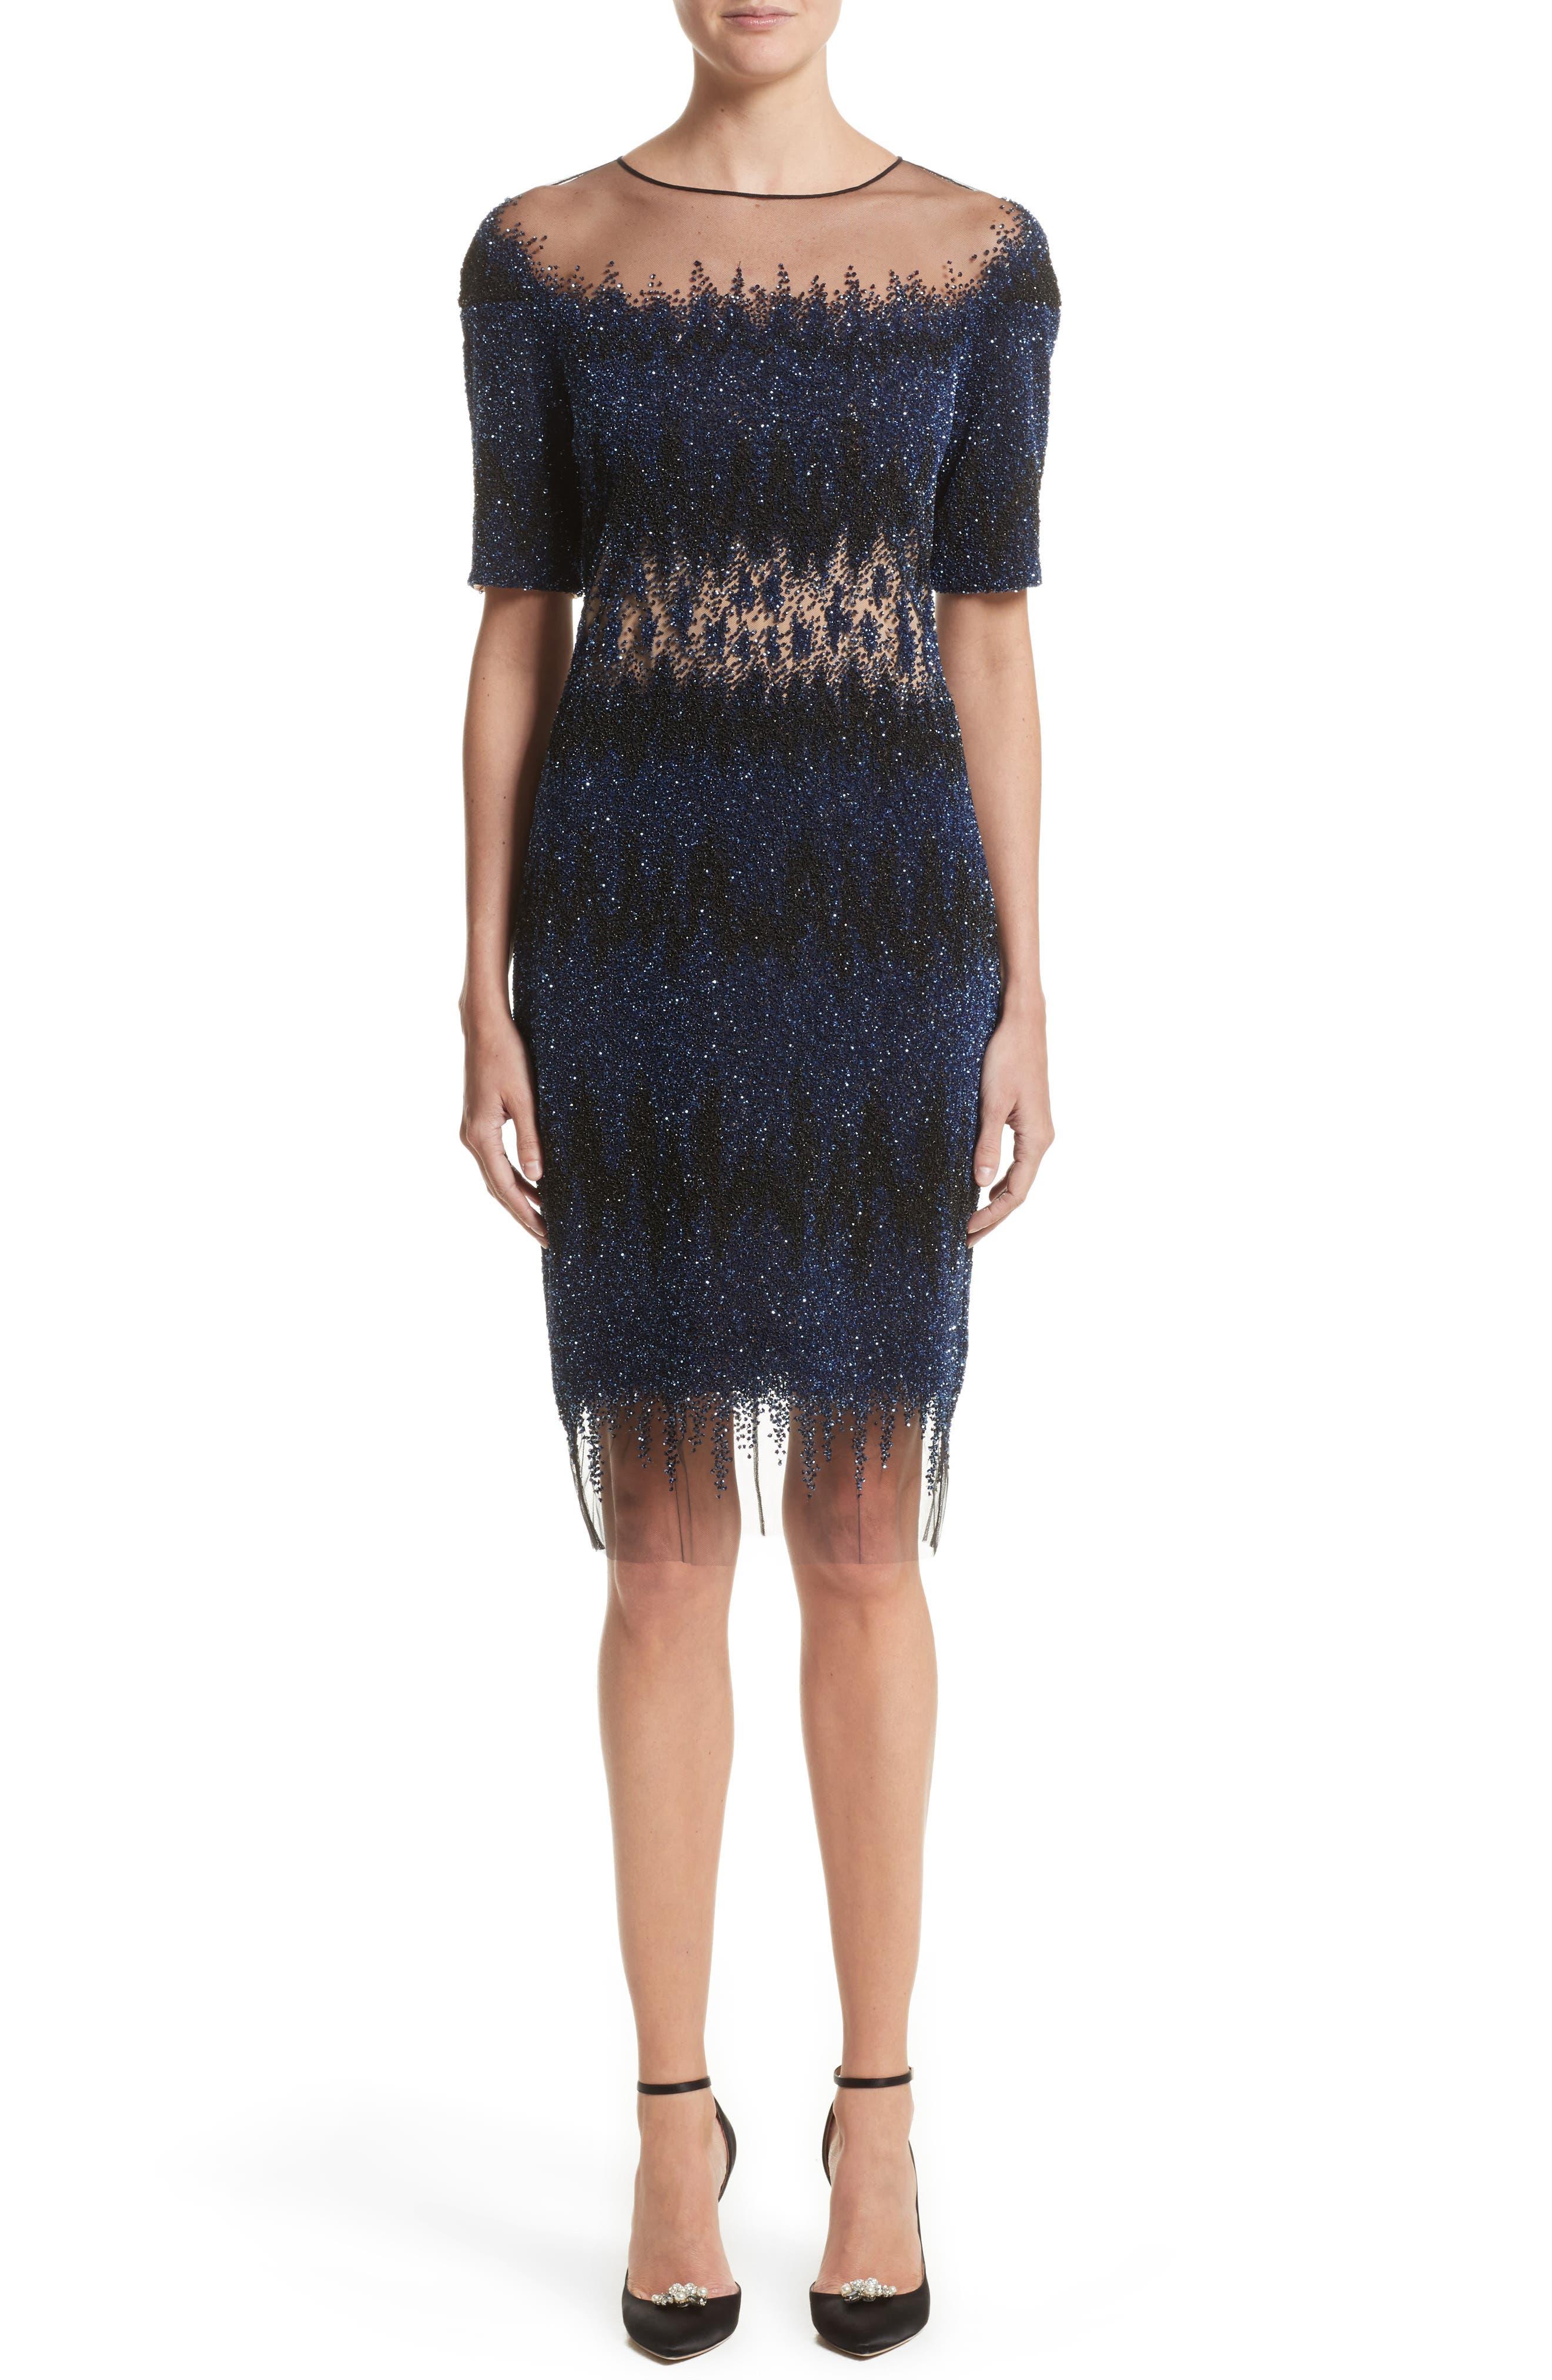 Pamella Roland Flame Stitch Sequin Cocktail Dress